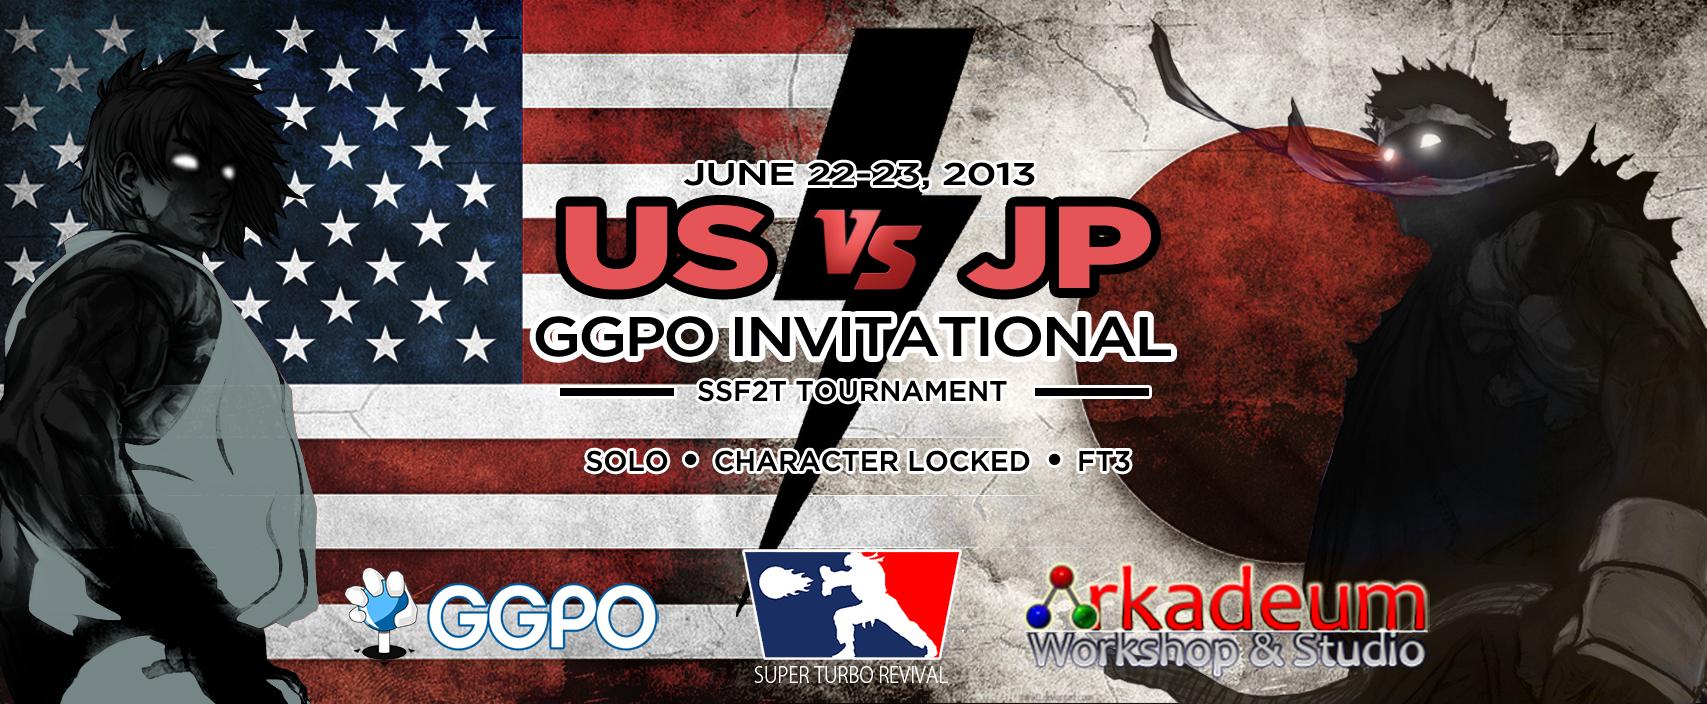 str_ggpo_us_japan_invitational_banner.png